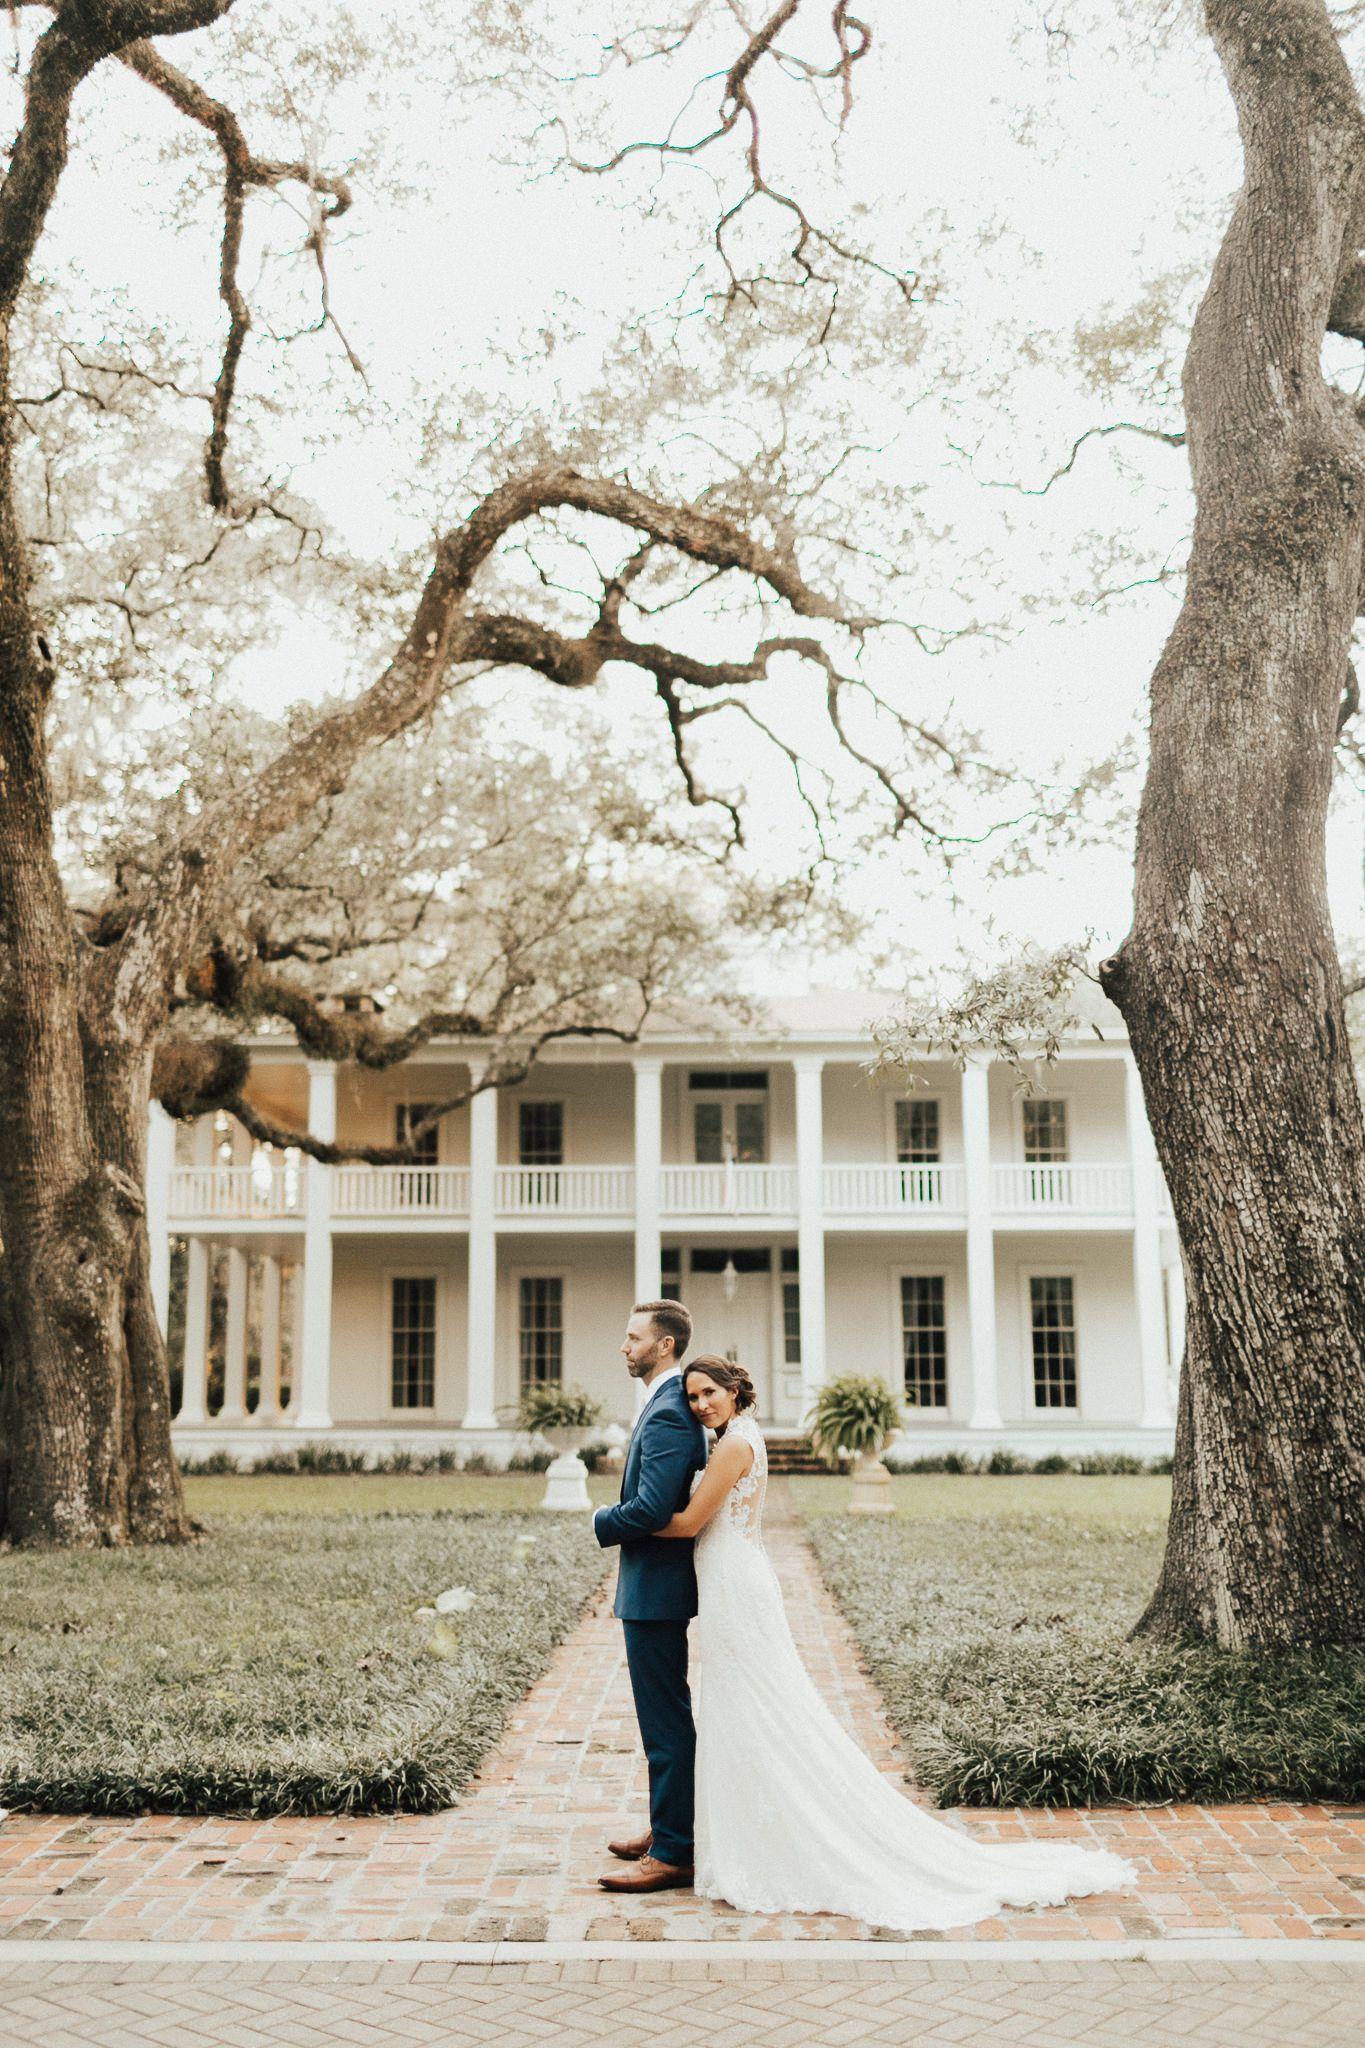 October Eden Gardens State Park Wedding Park weddings